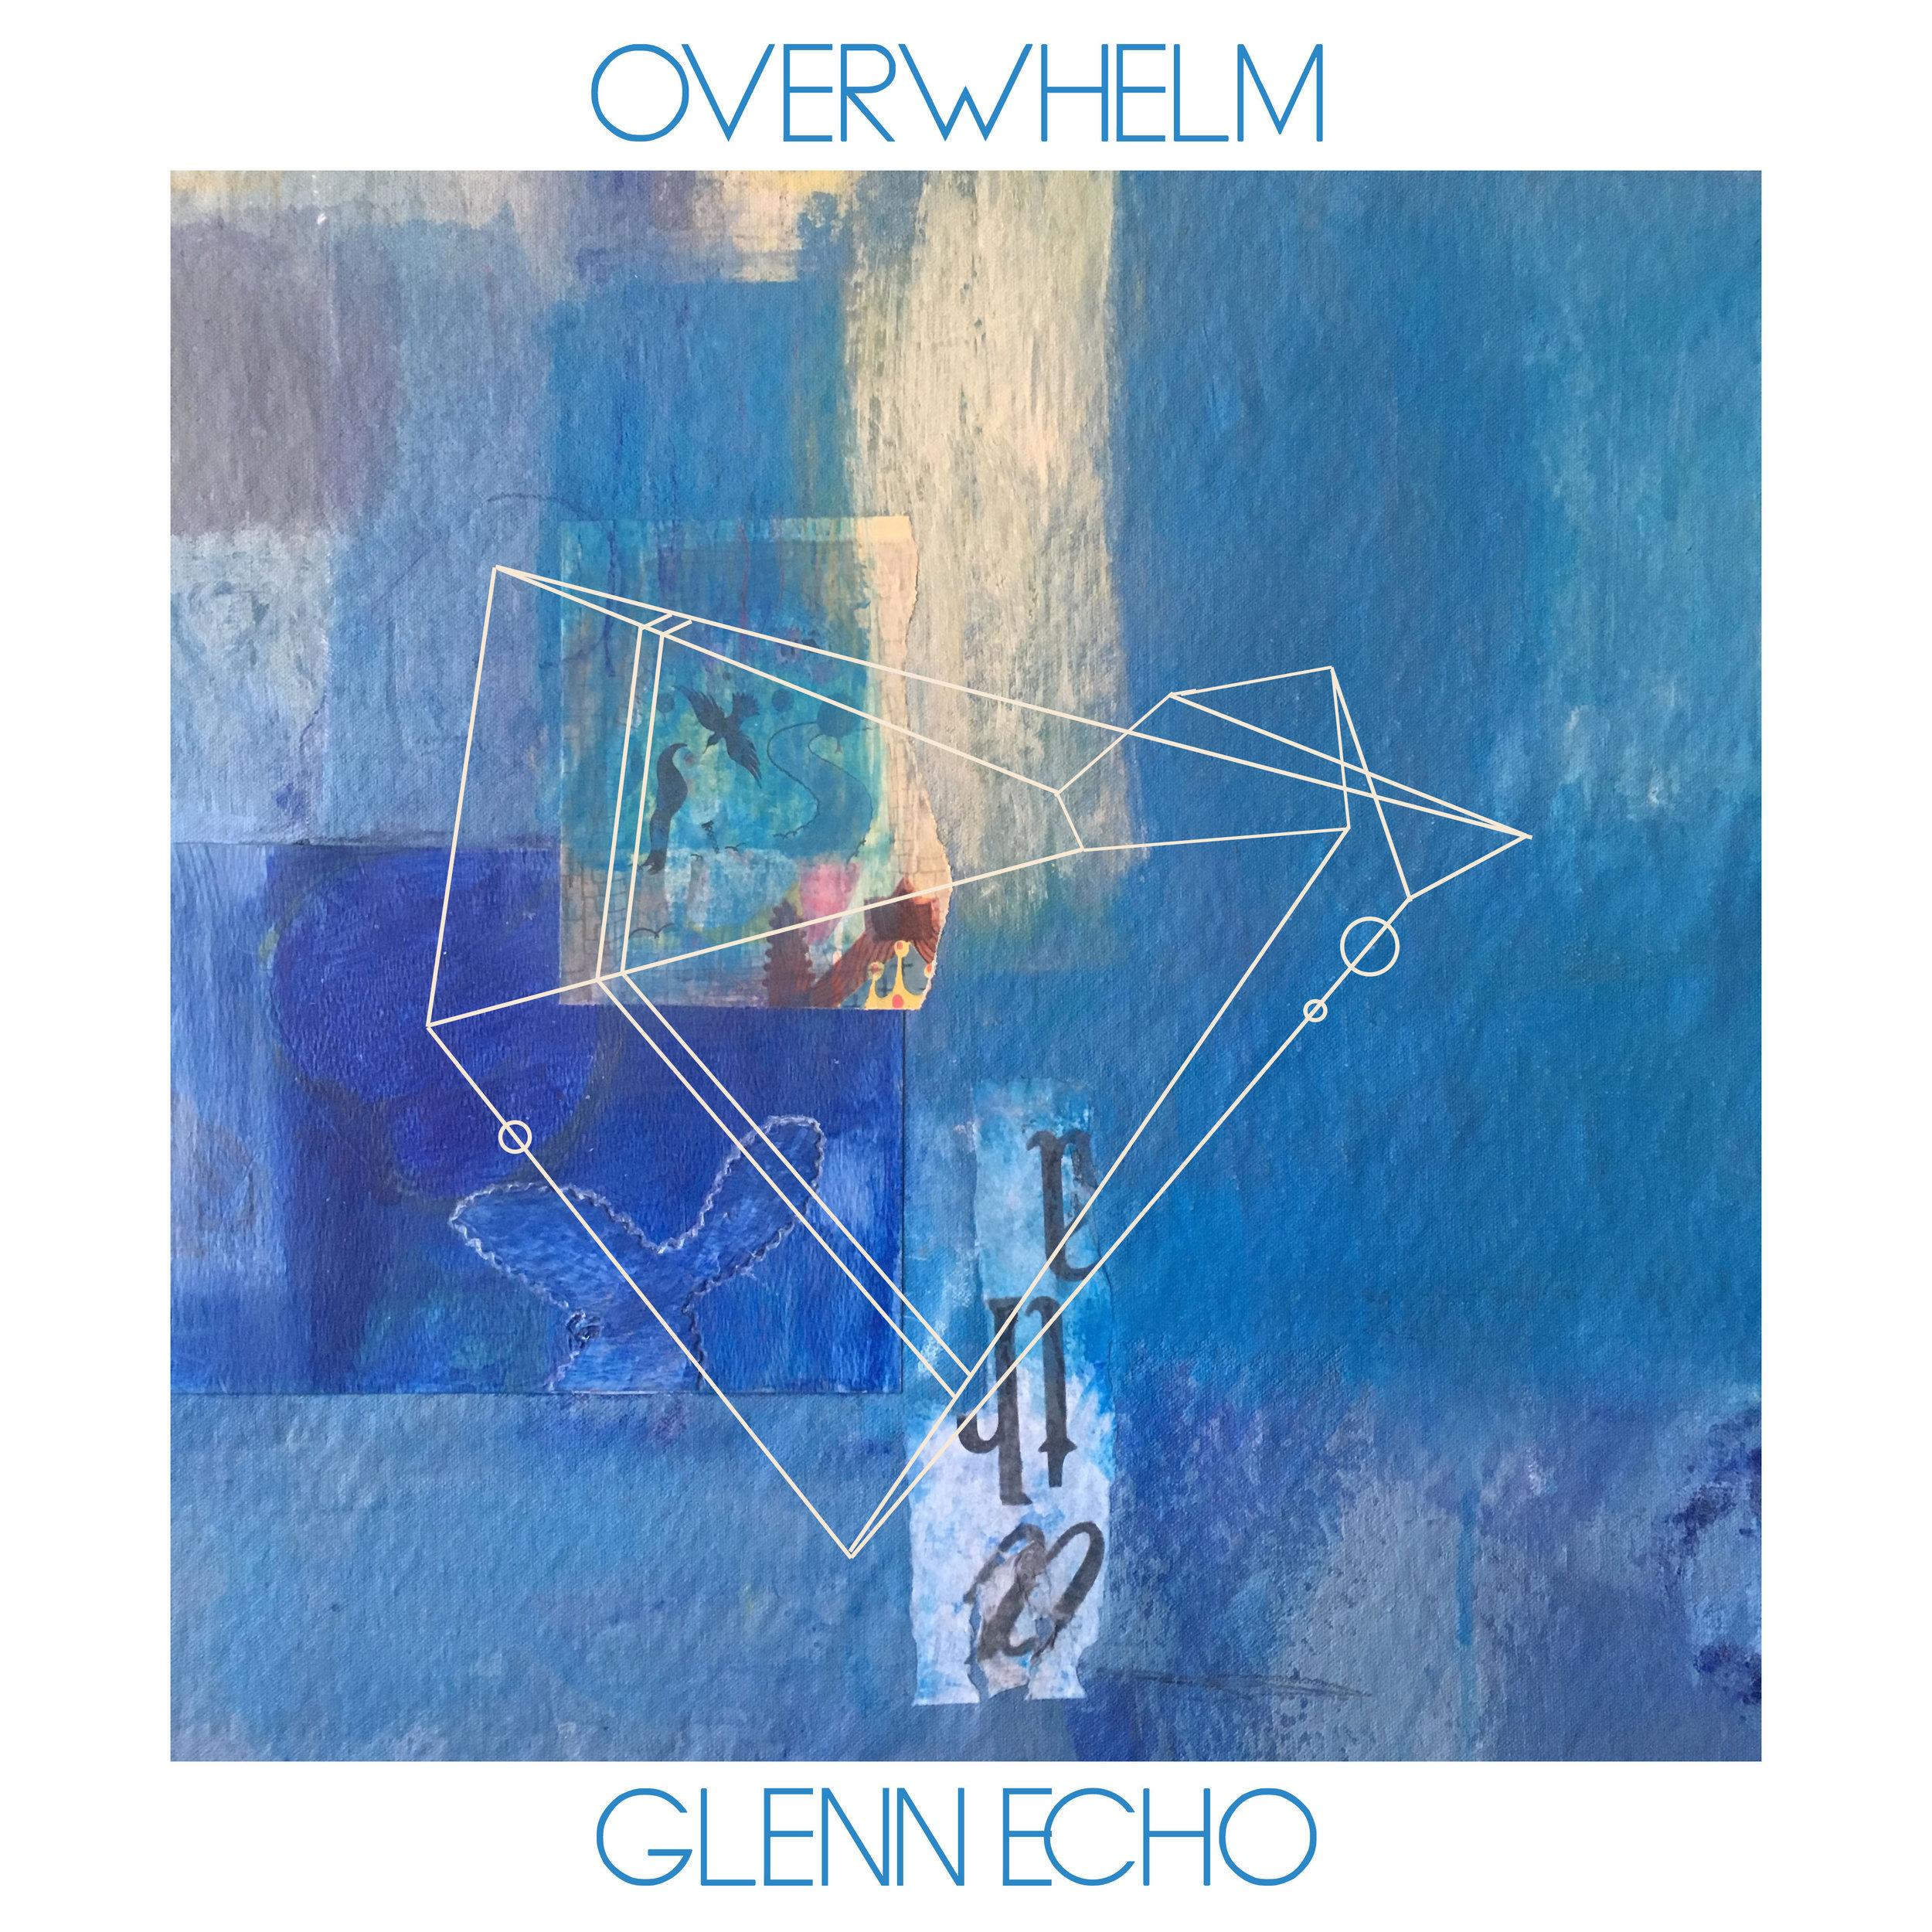 Glenn Echo - Overwhelm (single)